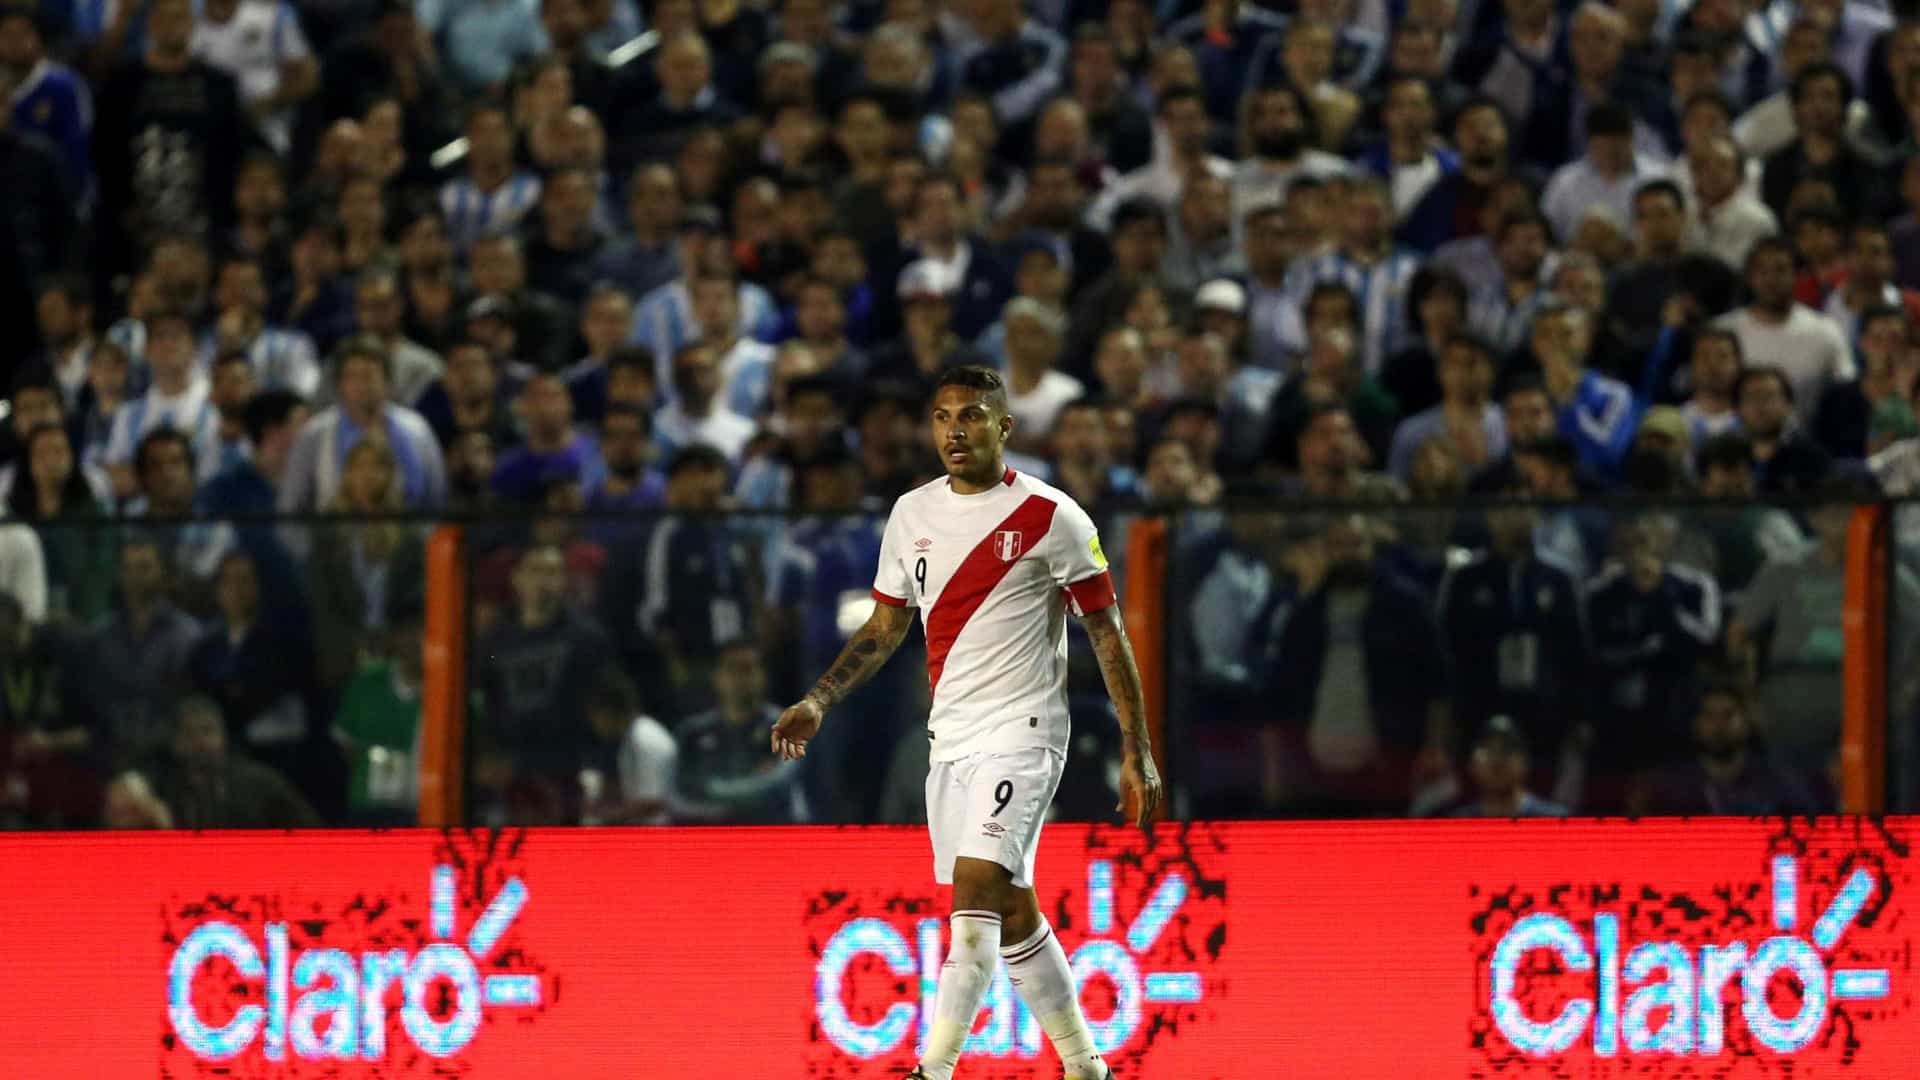 Guerrero sobre doping: 'Mostro as provas que eles quiserem'